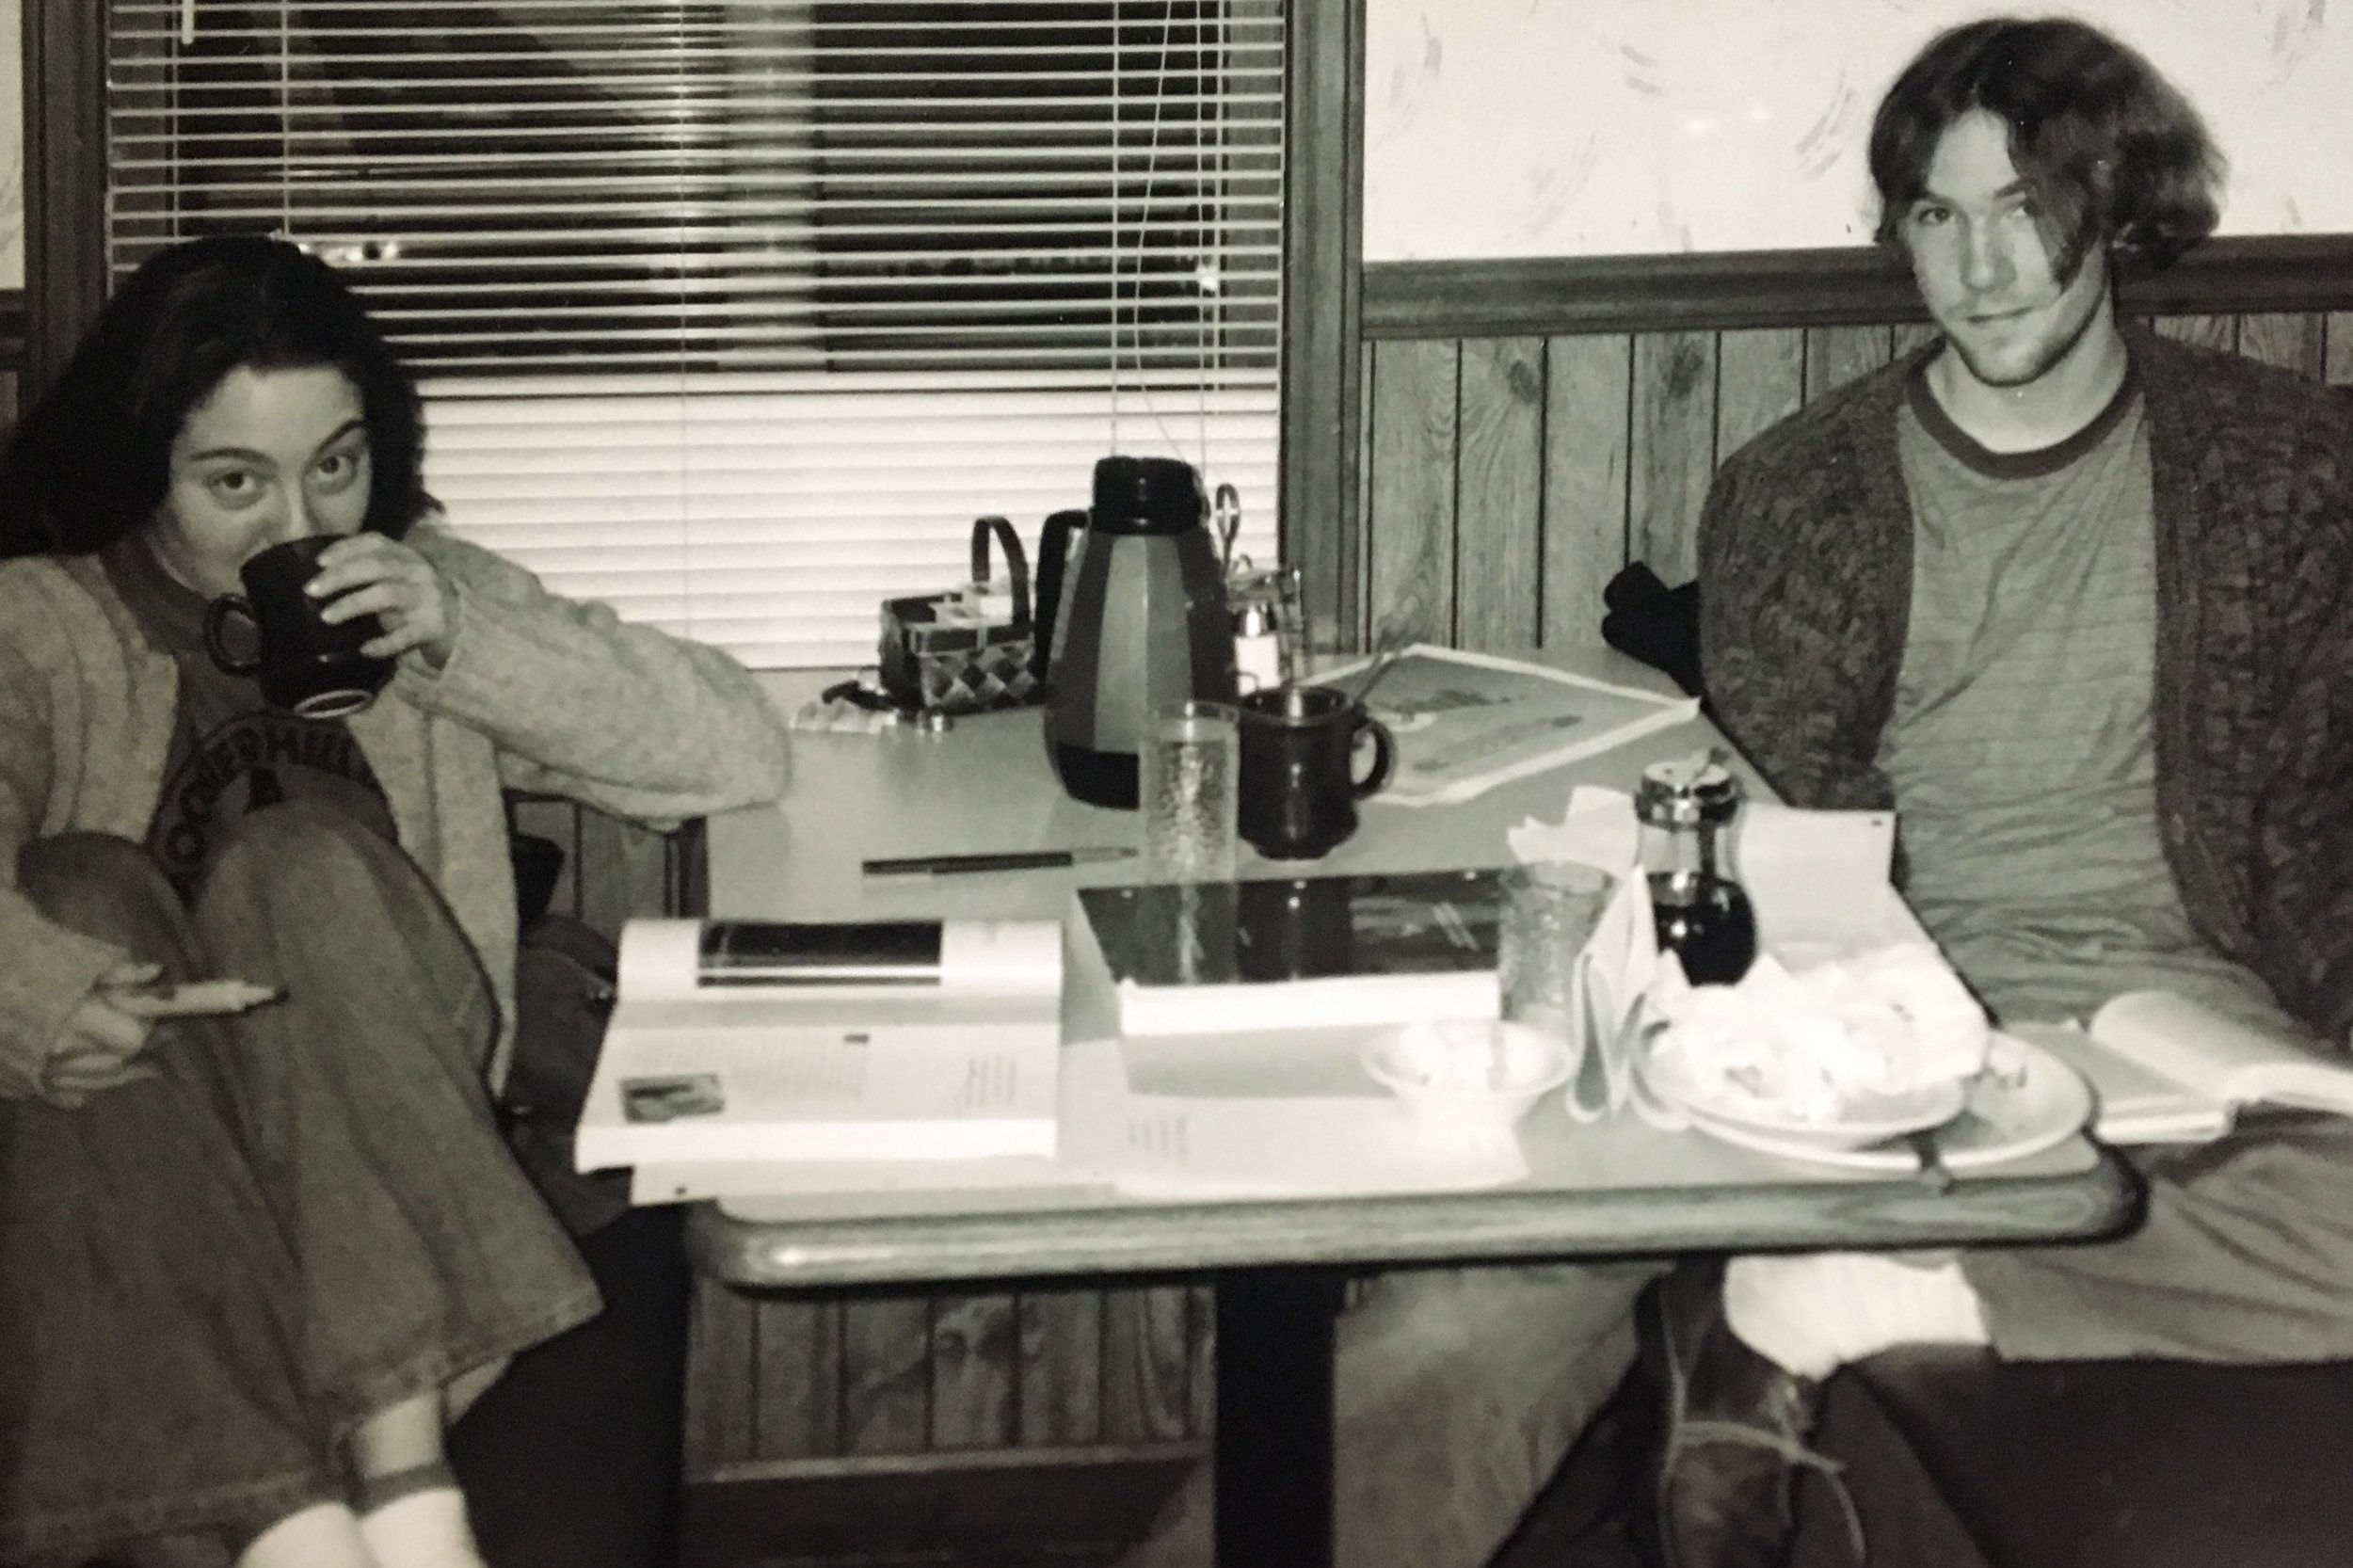 Sara and Drew, AKA the cardigan couple, AKA just kids. Sunshine Cafe, Muncie, IN, 1997.